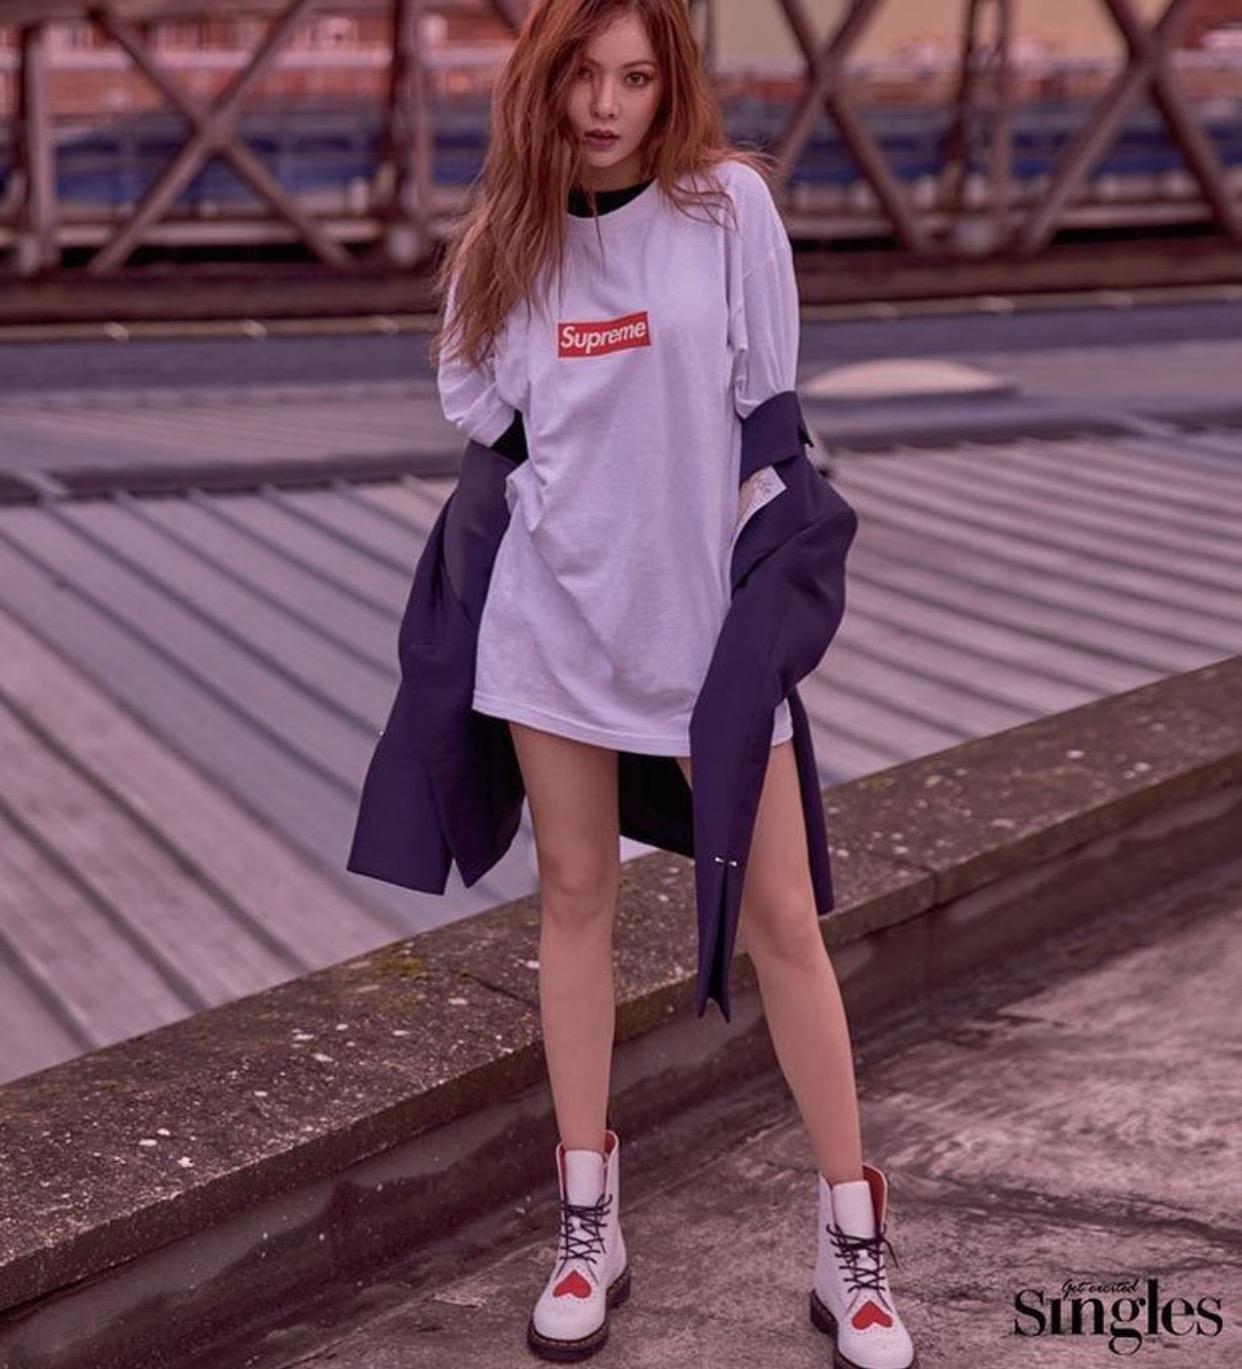 10 Best Fashion Looks For Petite Girls According To Korean Men Koreaboo